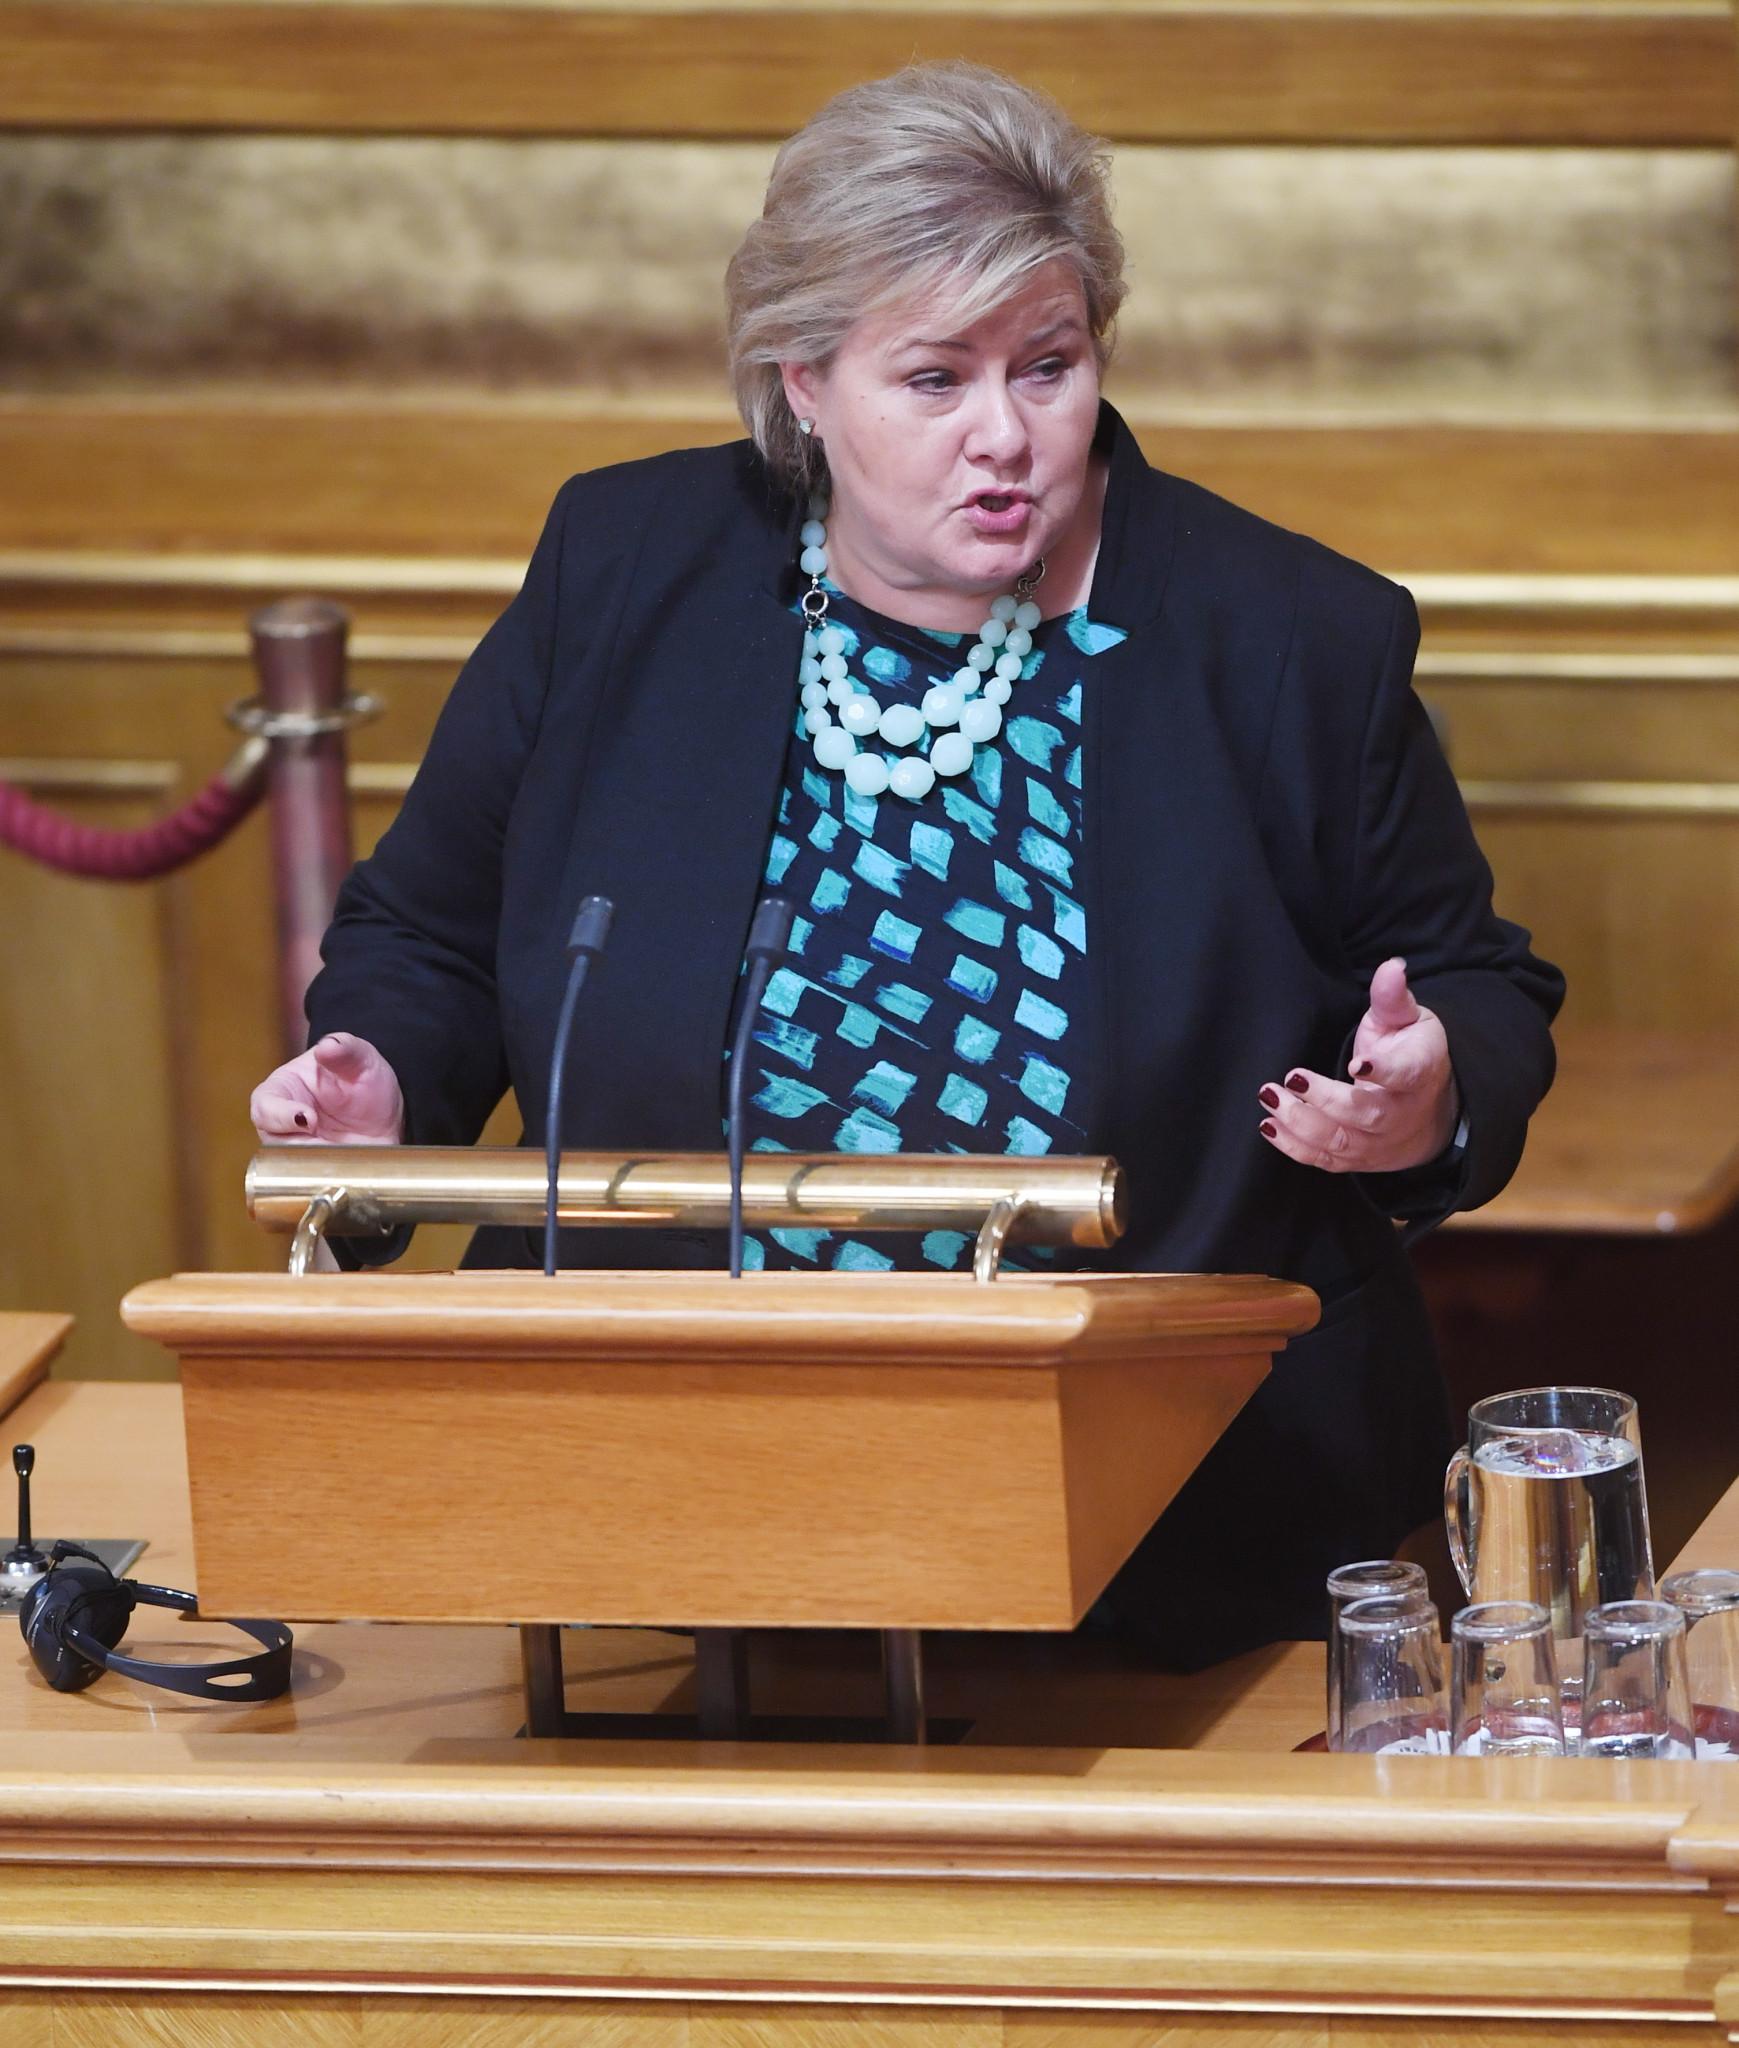 Norwegian Prime Minister Erna Solberg has given her full support to Linda Helleland's bid ©Getty Images